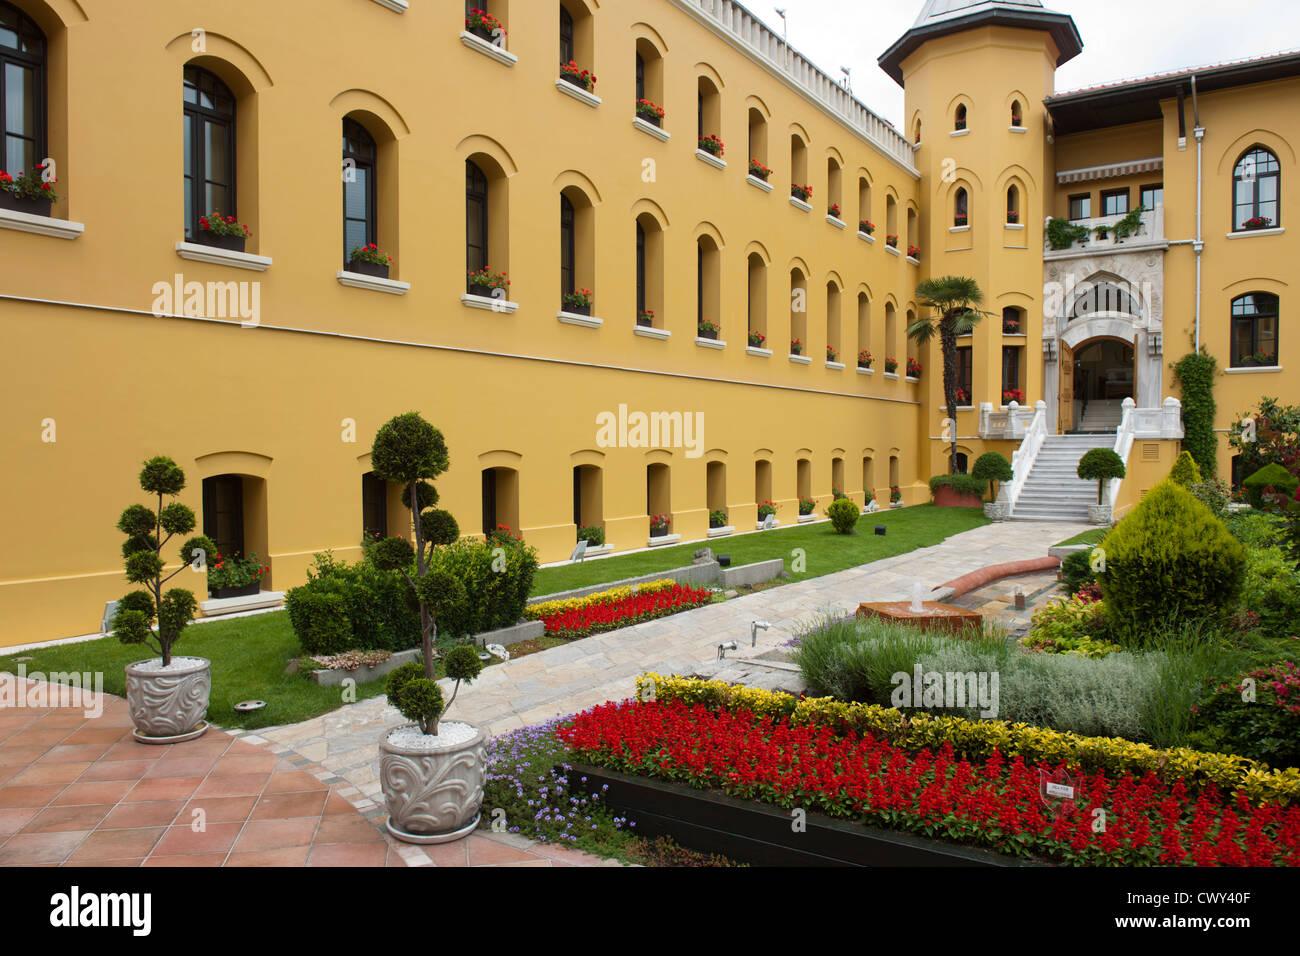 Türkei, Istanbul, Sultanahmet, Four Seasons Hotel Sultanahmet im Gebäude des ehemaligen Gefängnisses Stock Photo